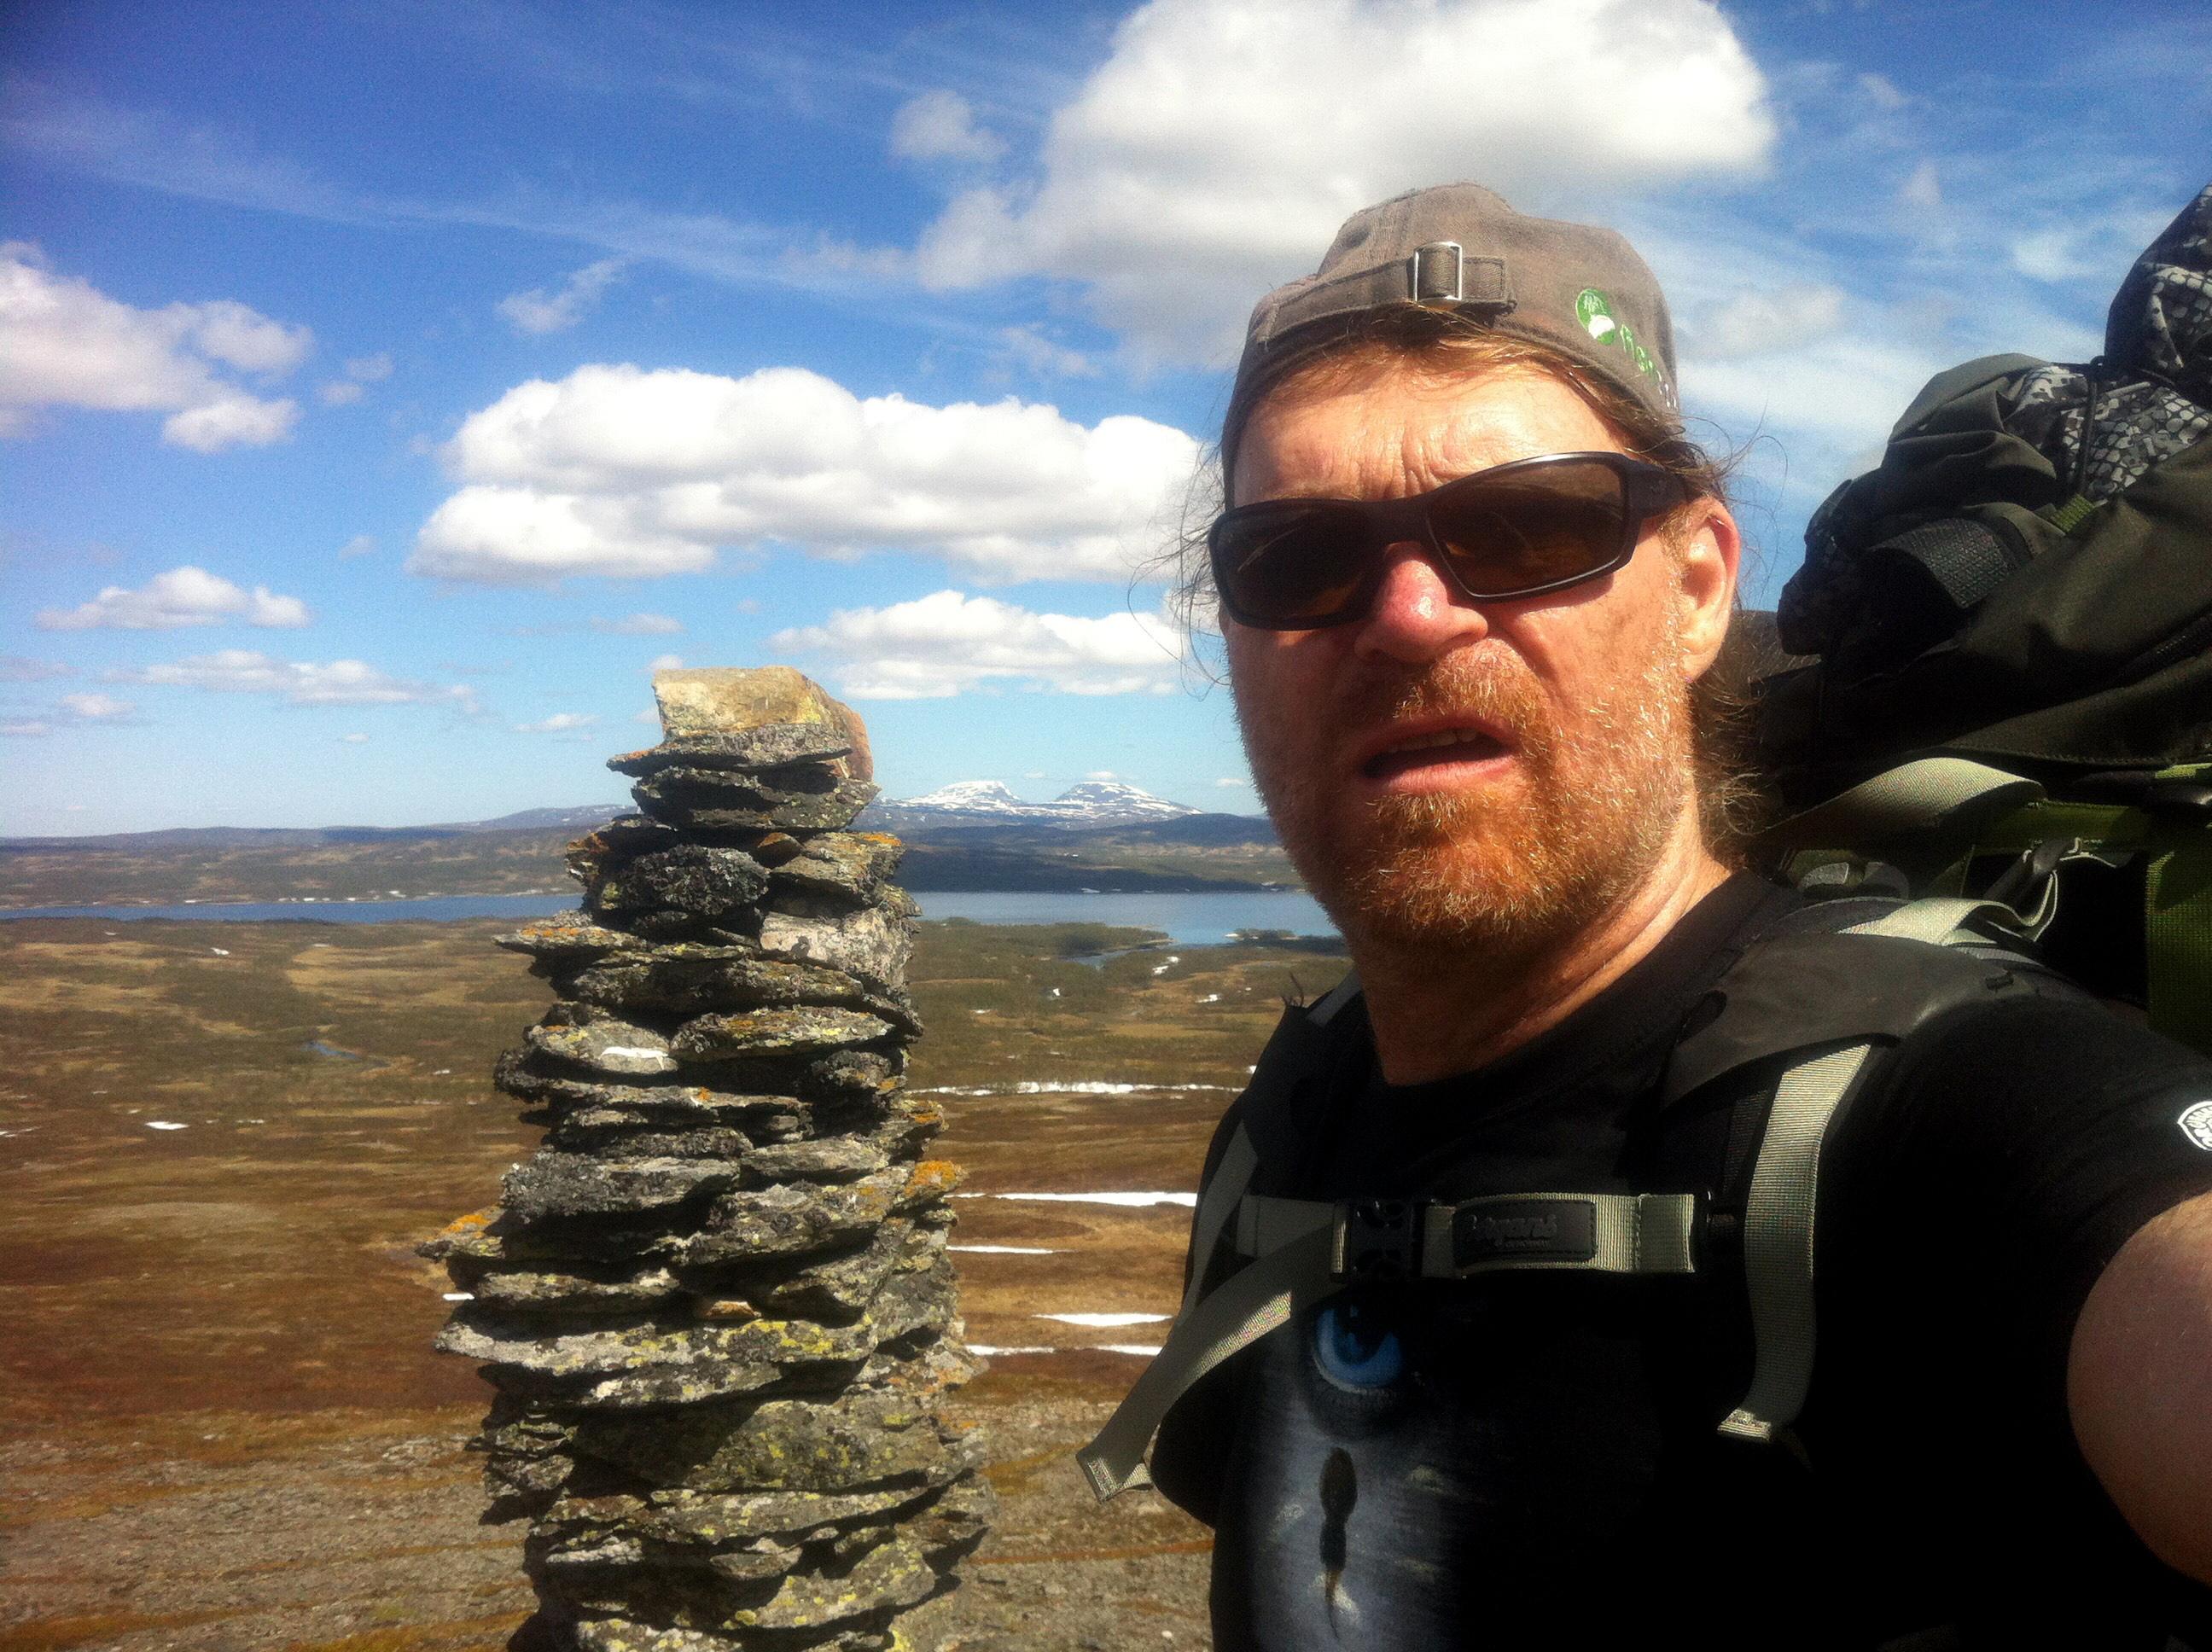 Cato Bekkevold var trommeslager i Enslaved fram til 2018. Enslaved er et norsk progressivt ekstremmetal-band med tekster som omhandler nordisk mytologi, vikinger og natur. Foto: Privat